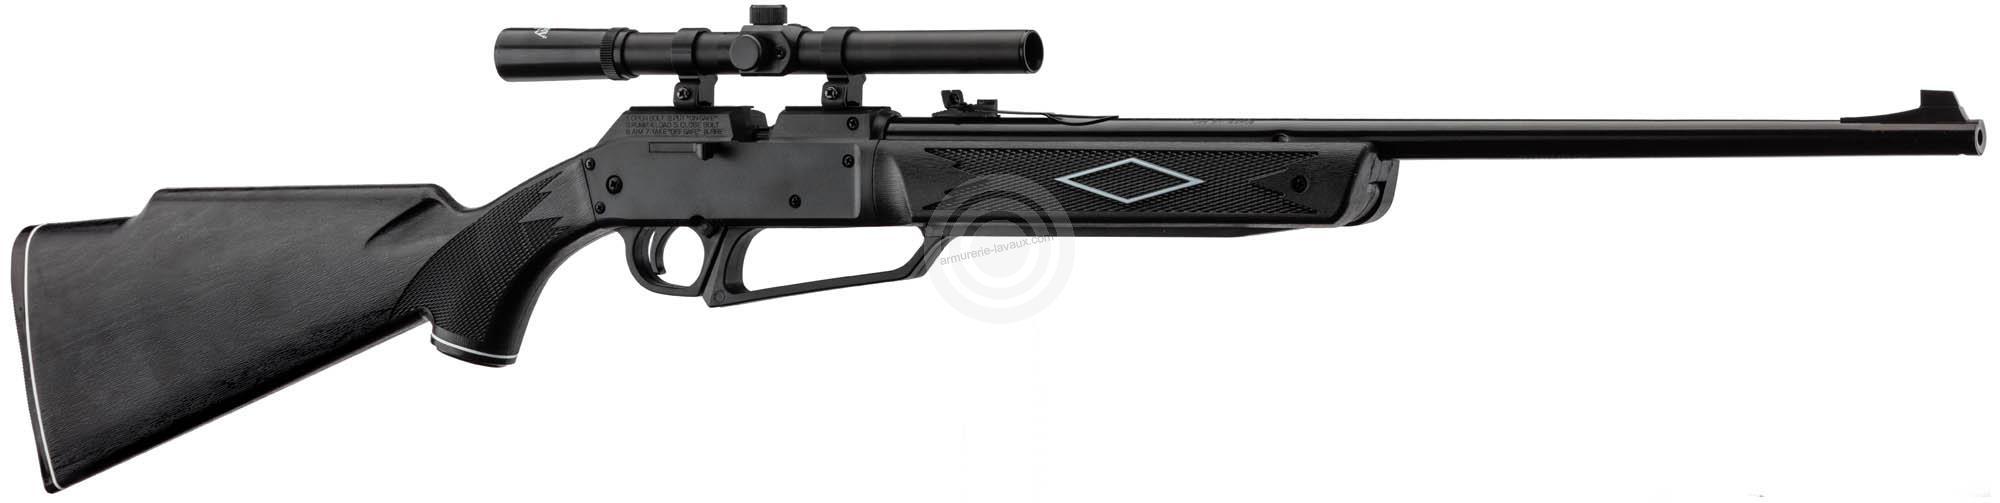 Carabine DAISY Multi-Pompe mod.5880 cal.4,5mm